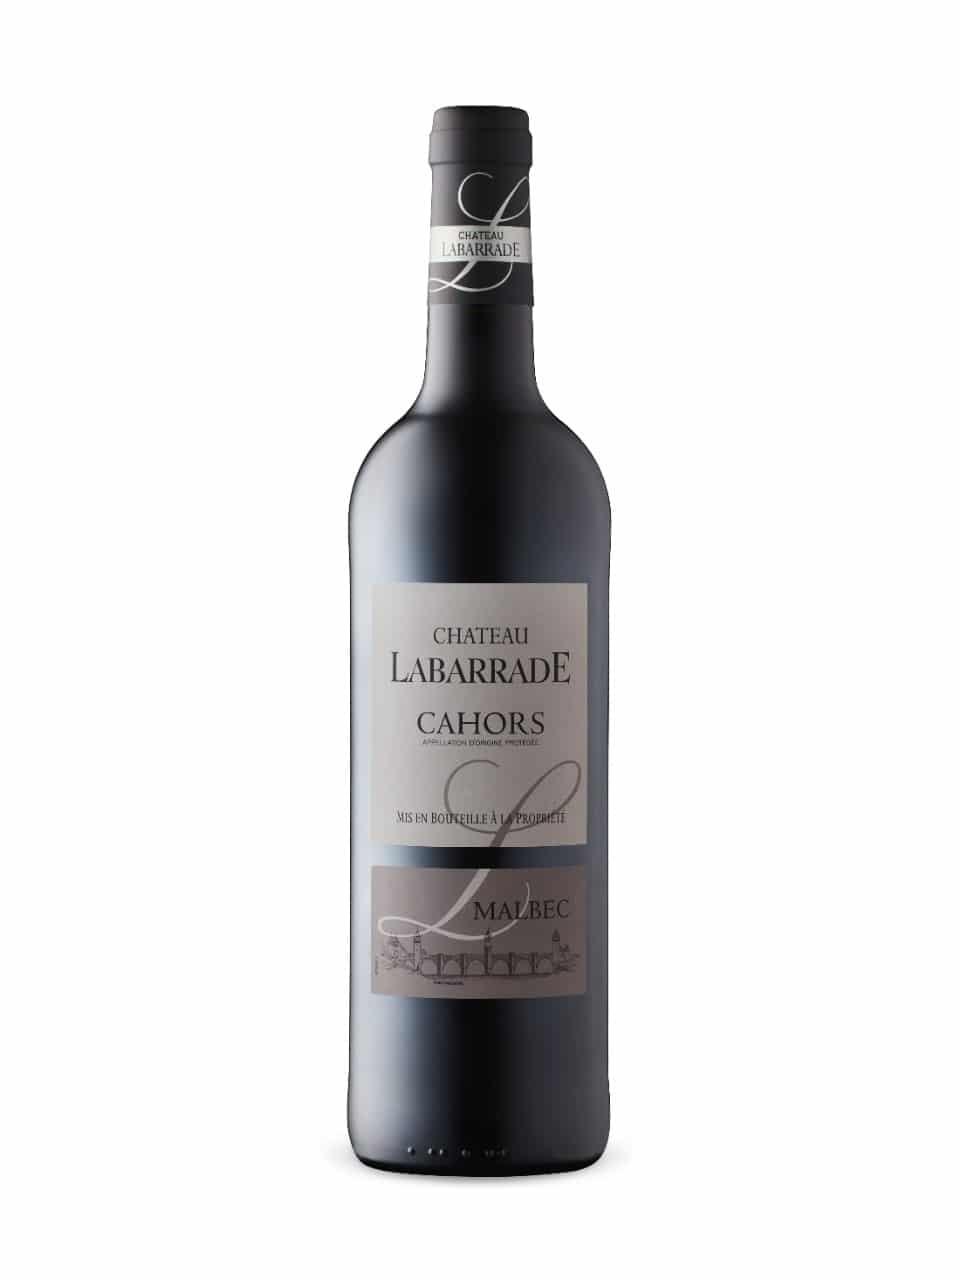 $13.85 - Chateau LaBarrade Malbec 2016